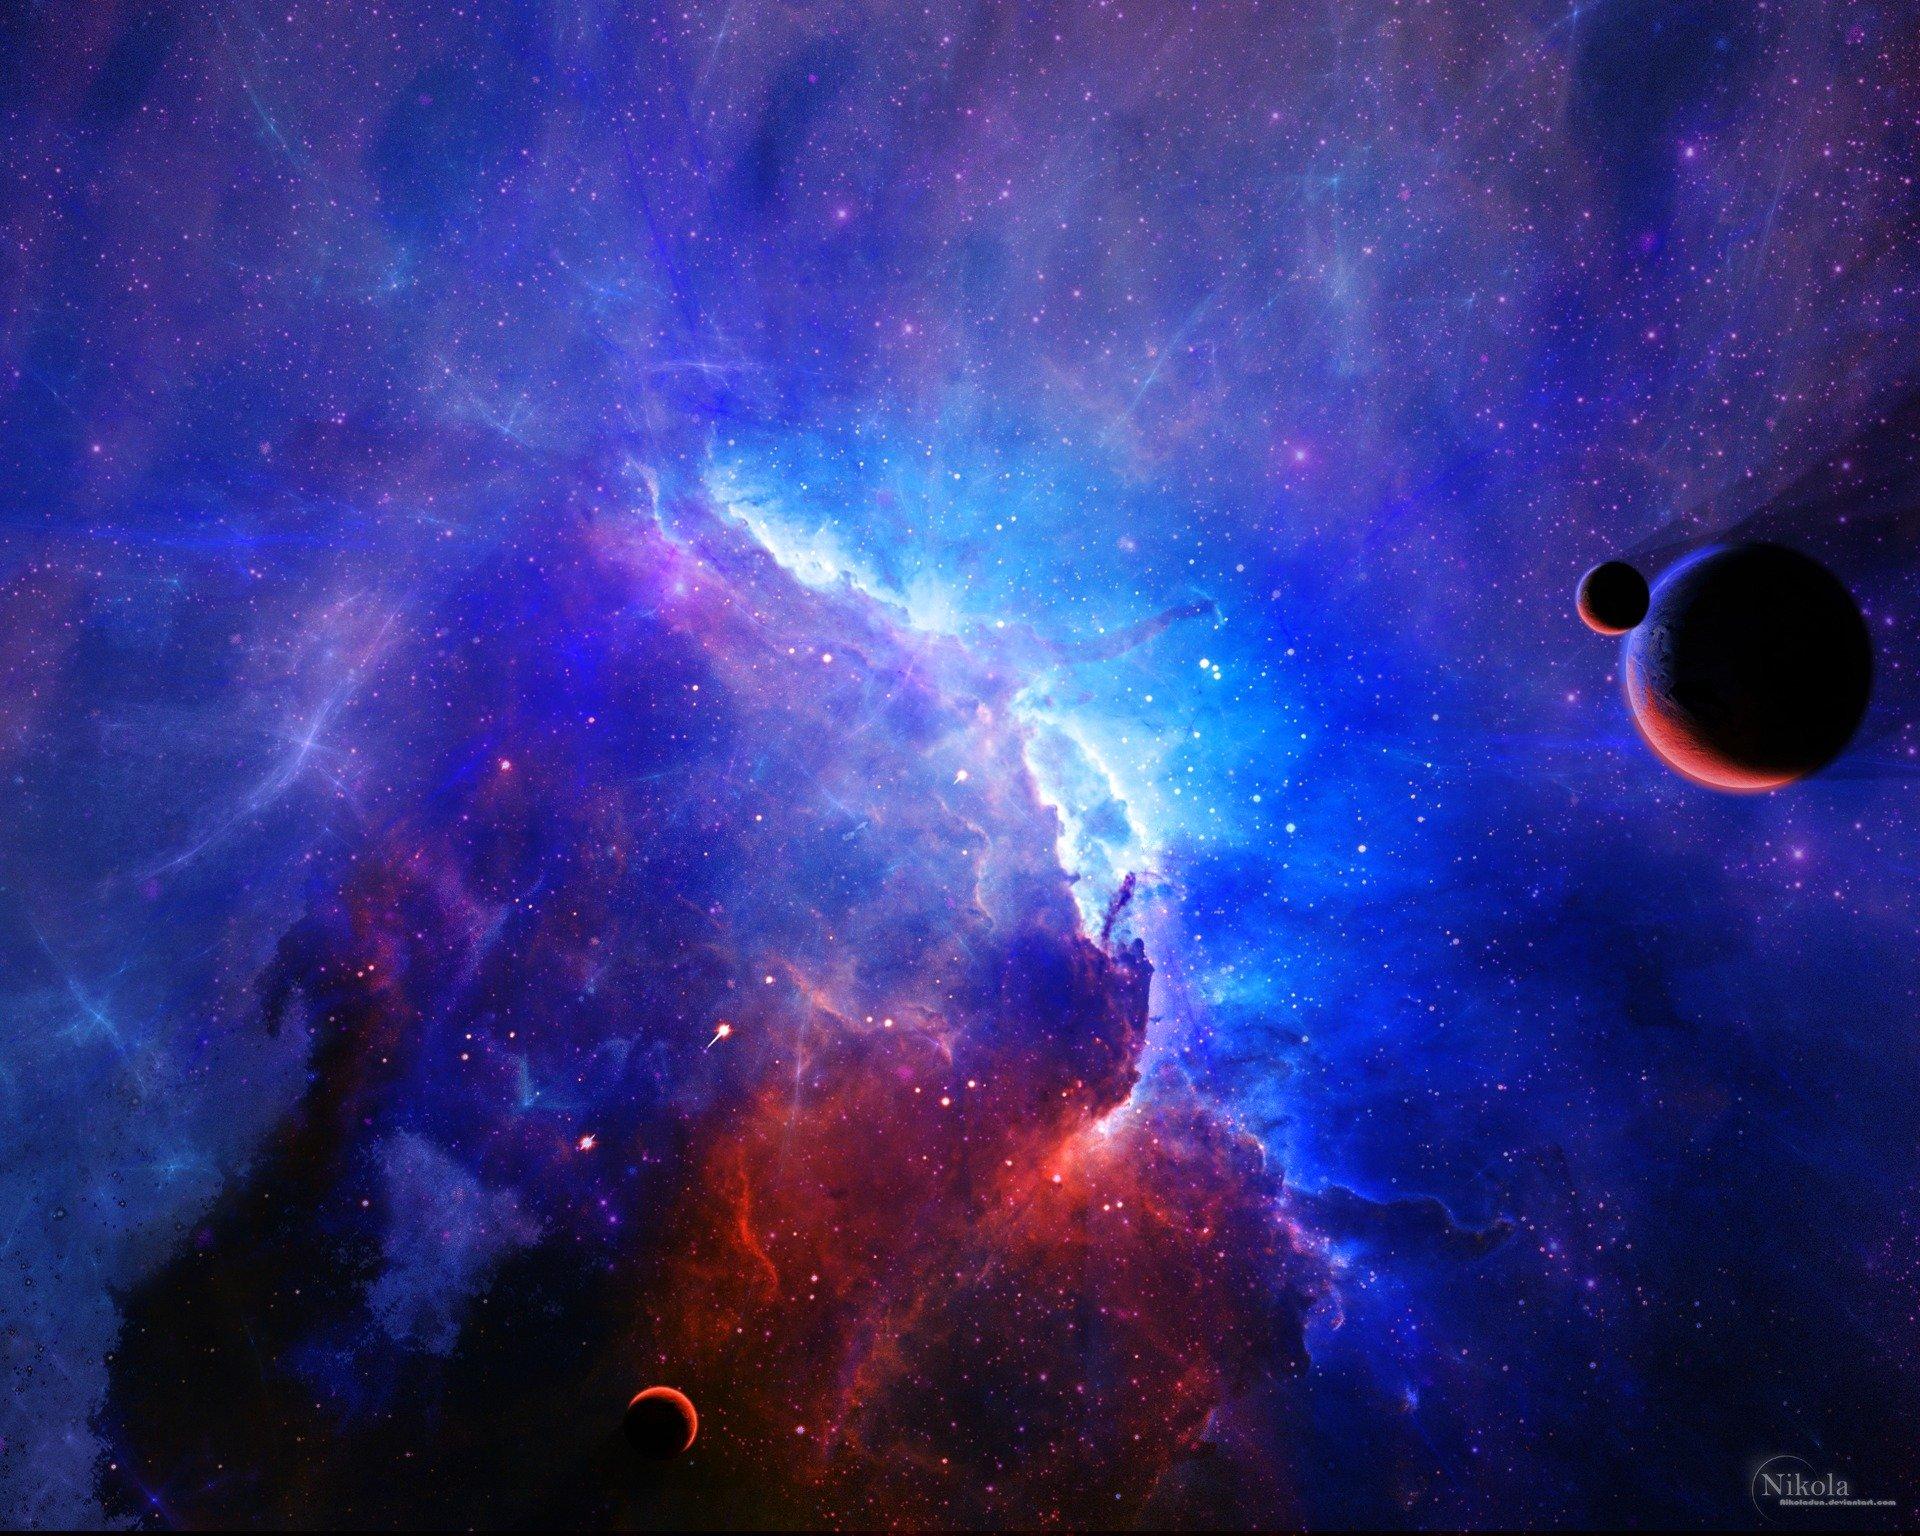 Картинки с космосом крутые, картинки